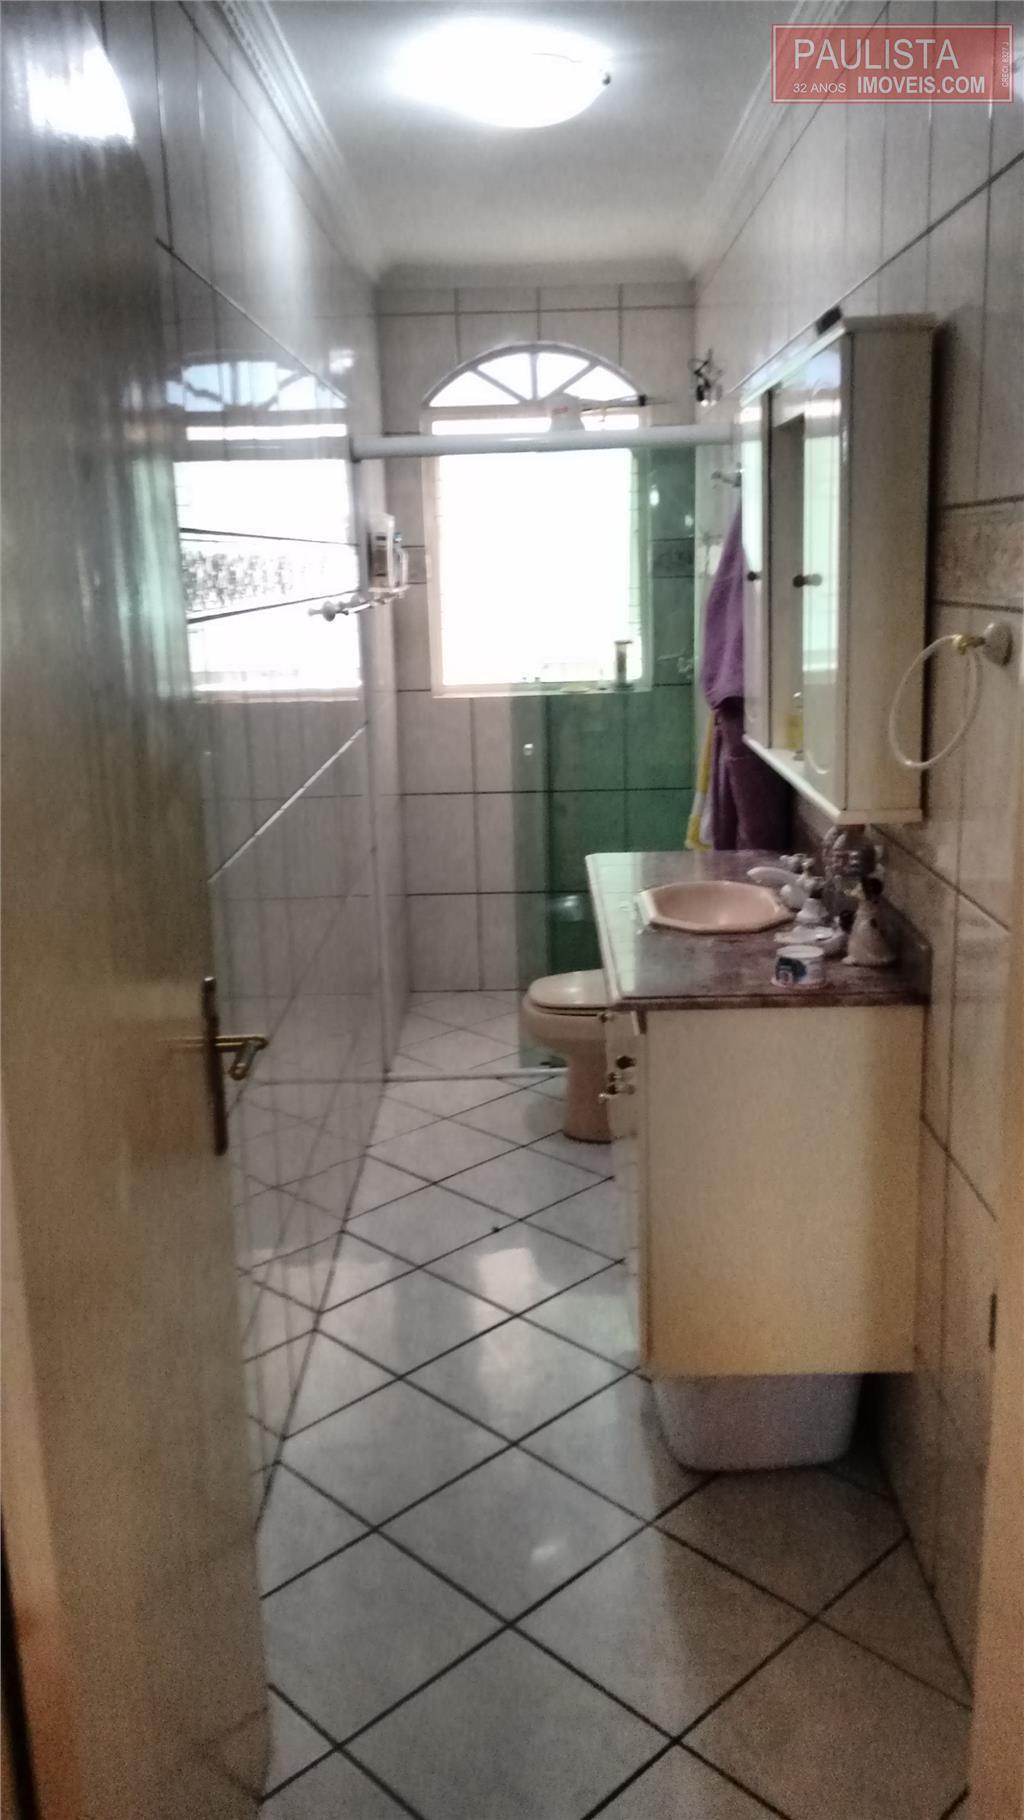 Casa 3 Dorm, Vila Santa Catarina, São Paulo (CA1089) - Foto 17